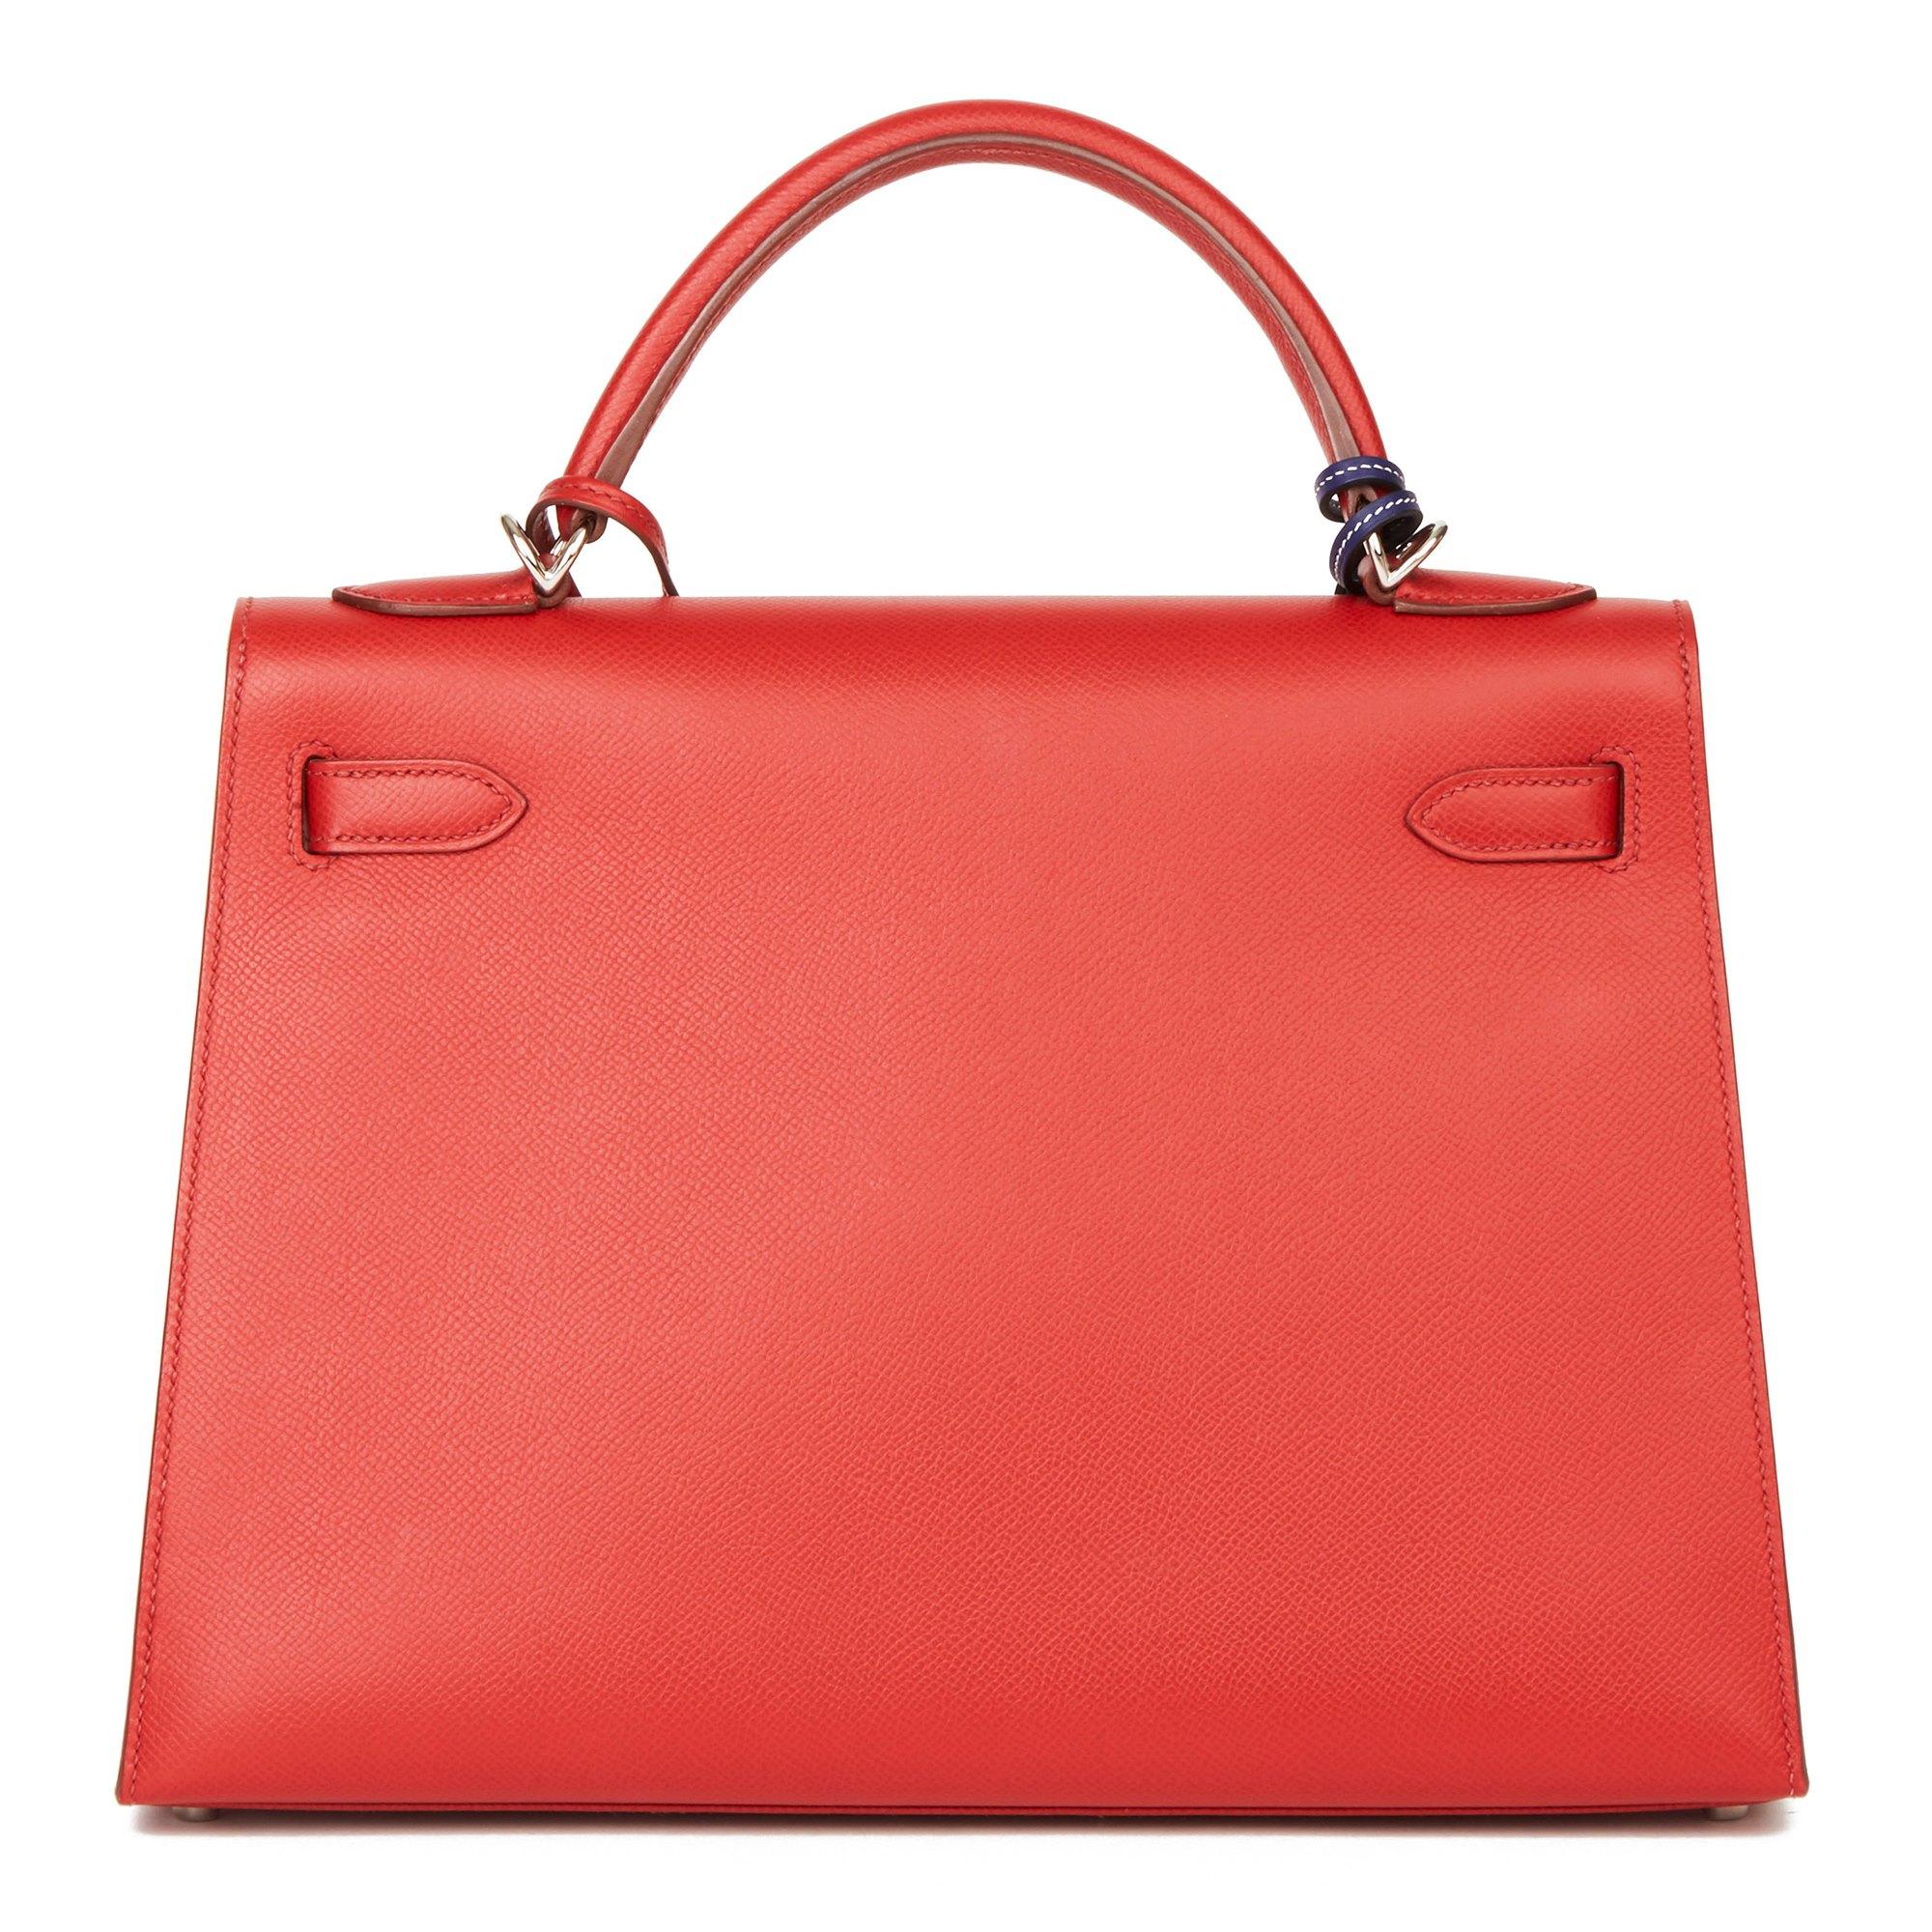 Hermès Rouge Garance Epsom Leather Kelly 32cm Sellier